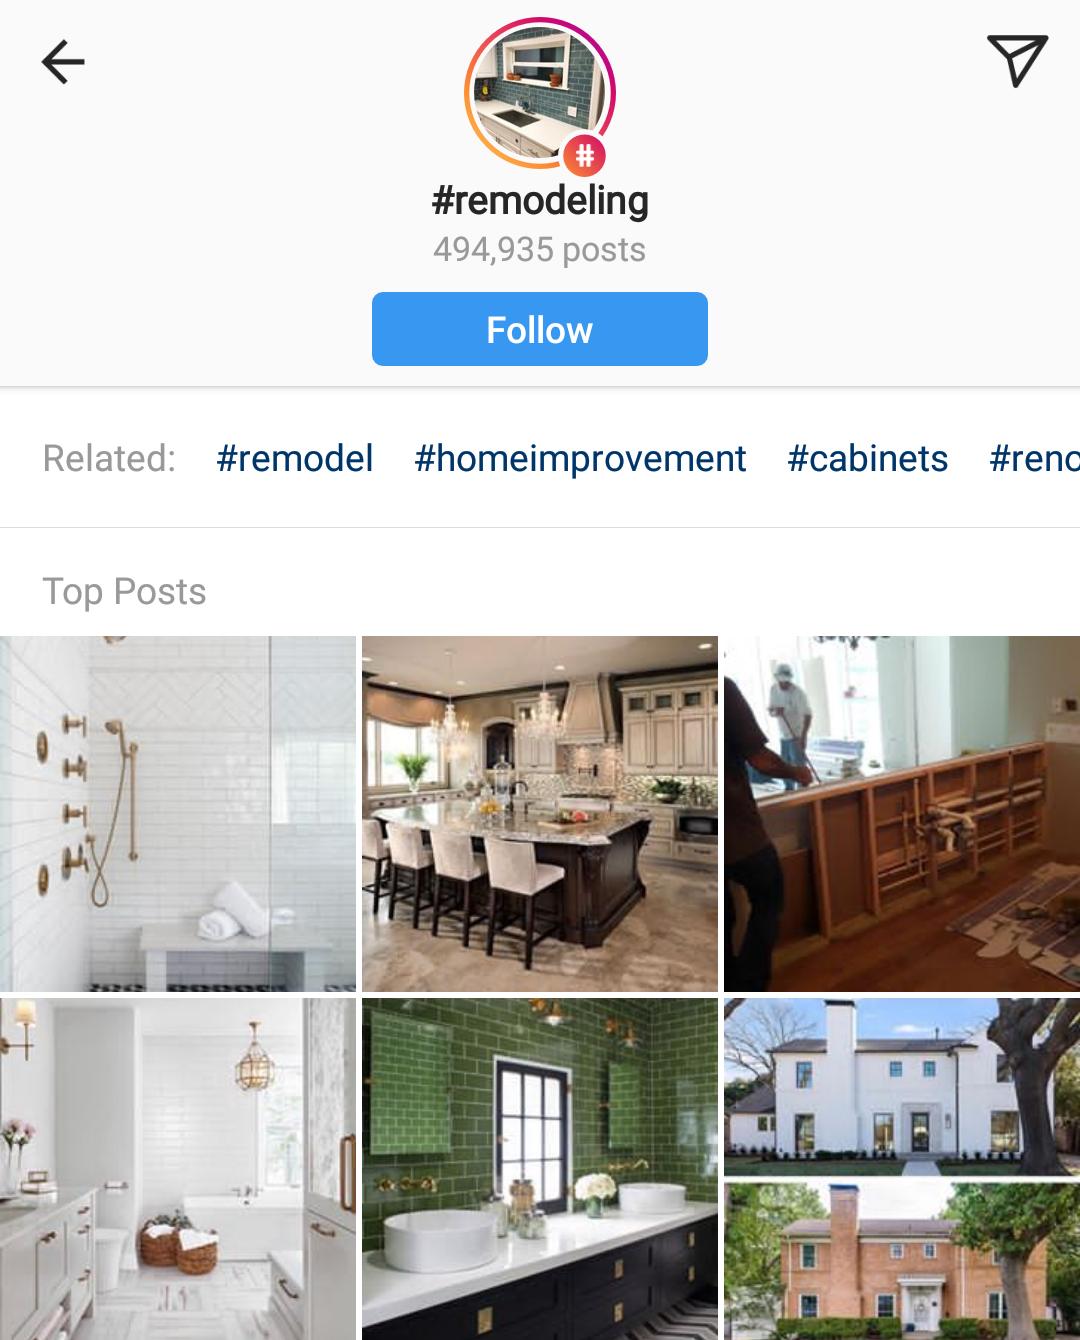 Using Relevant Hashtags on Instagram